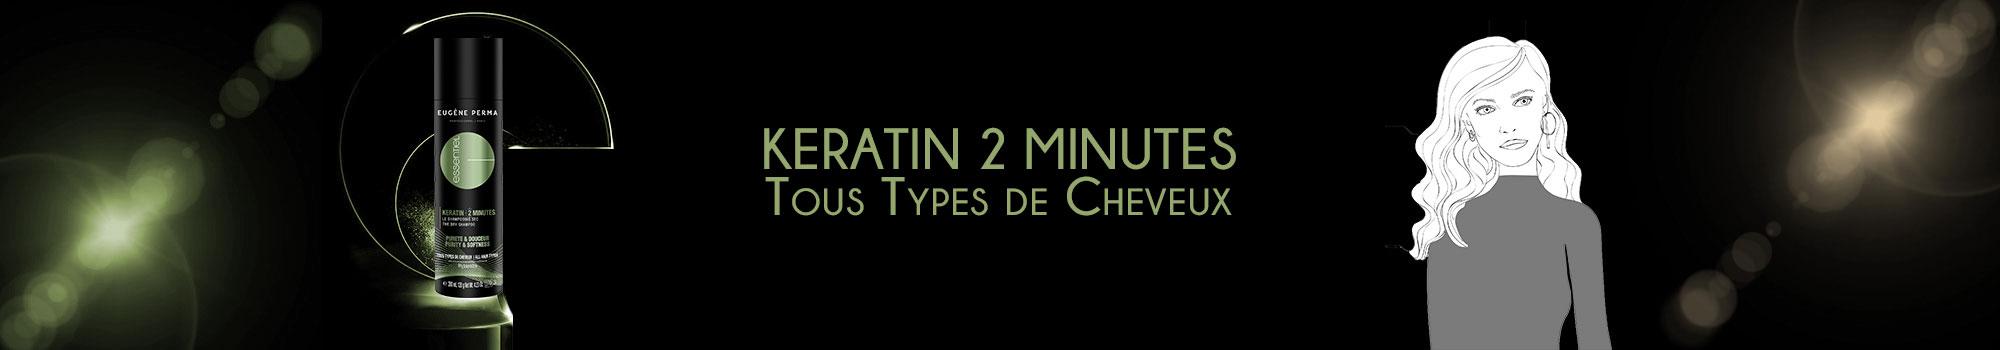 Keratin 2 Minutes Eugène Perma